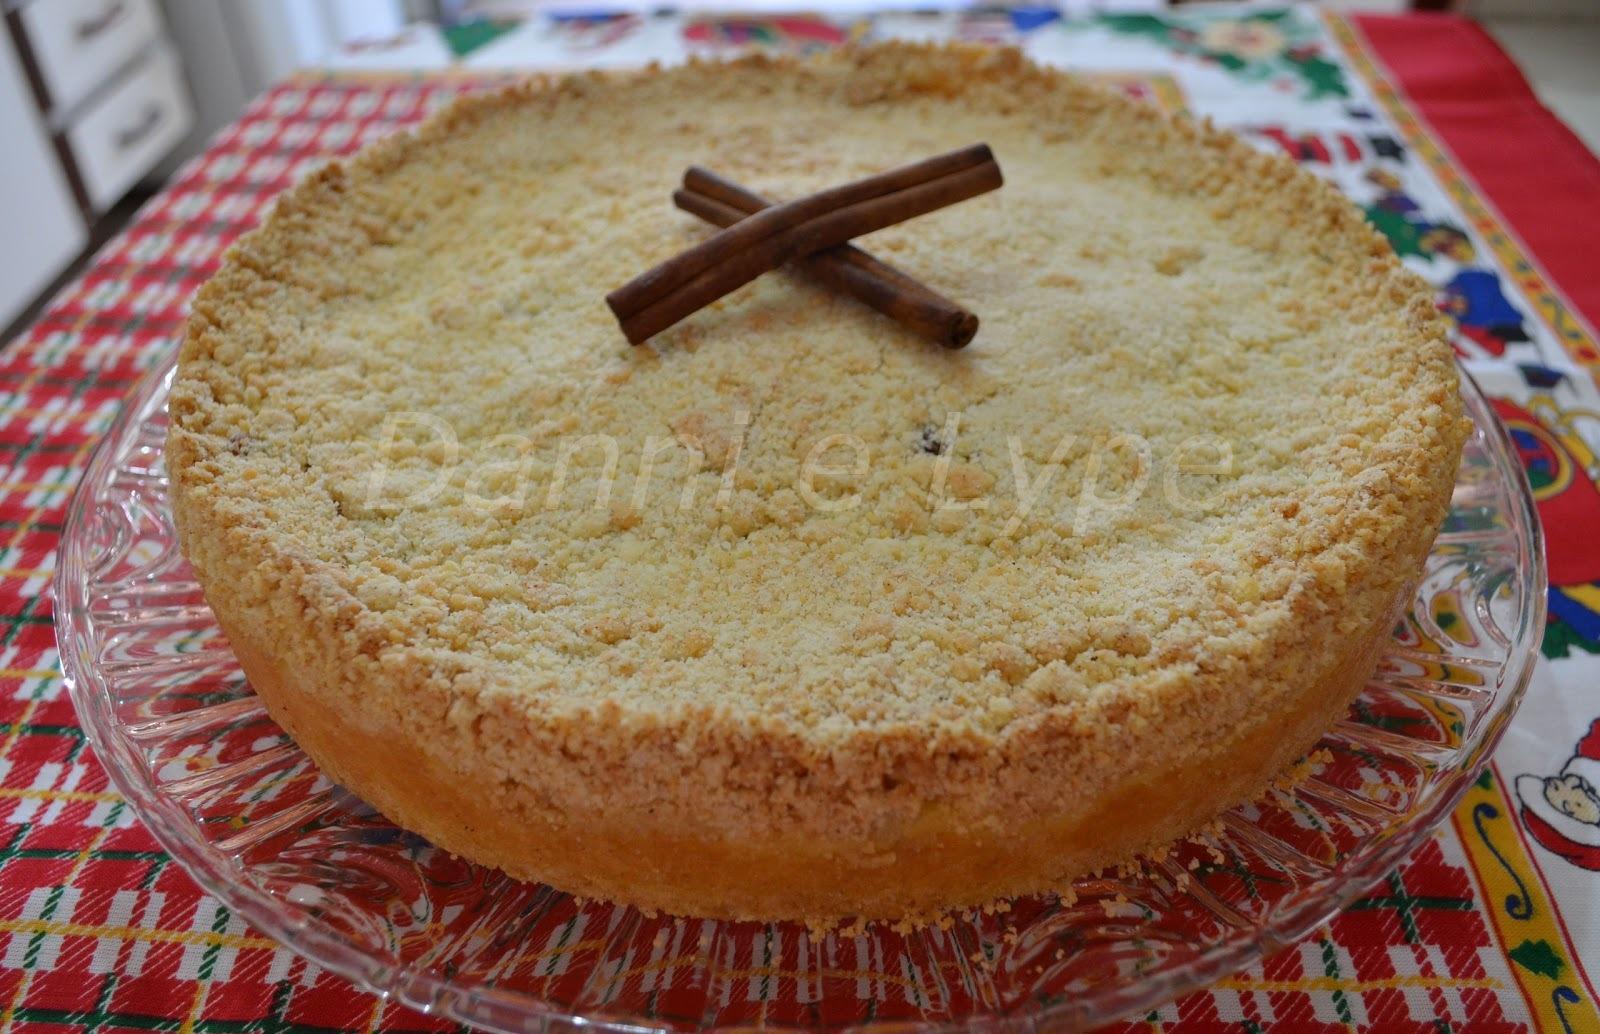 Torta de Farofa com Creme de Milho